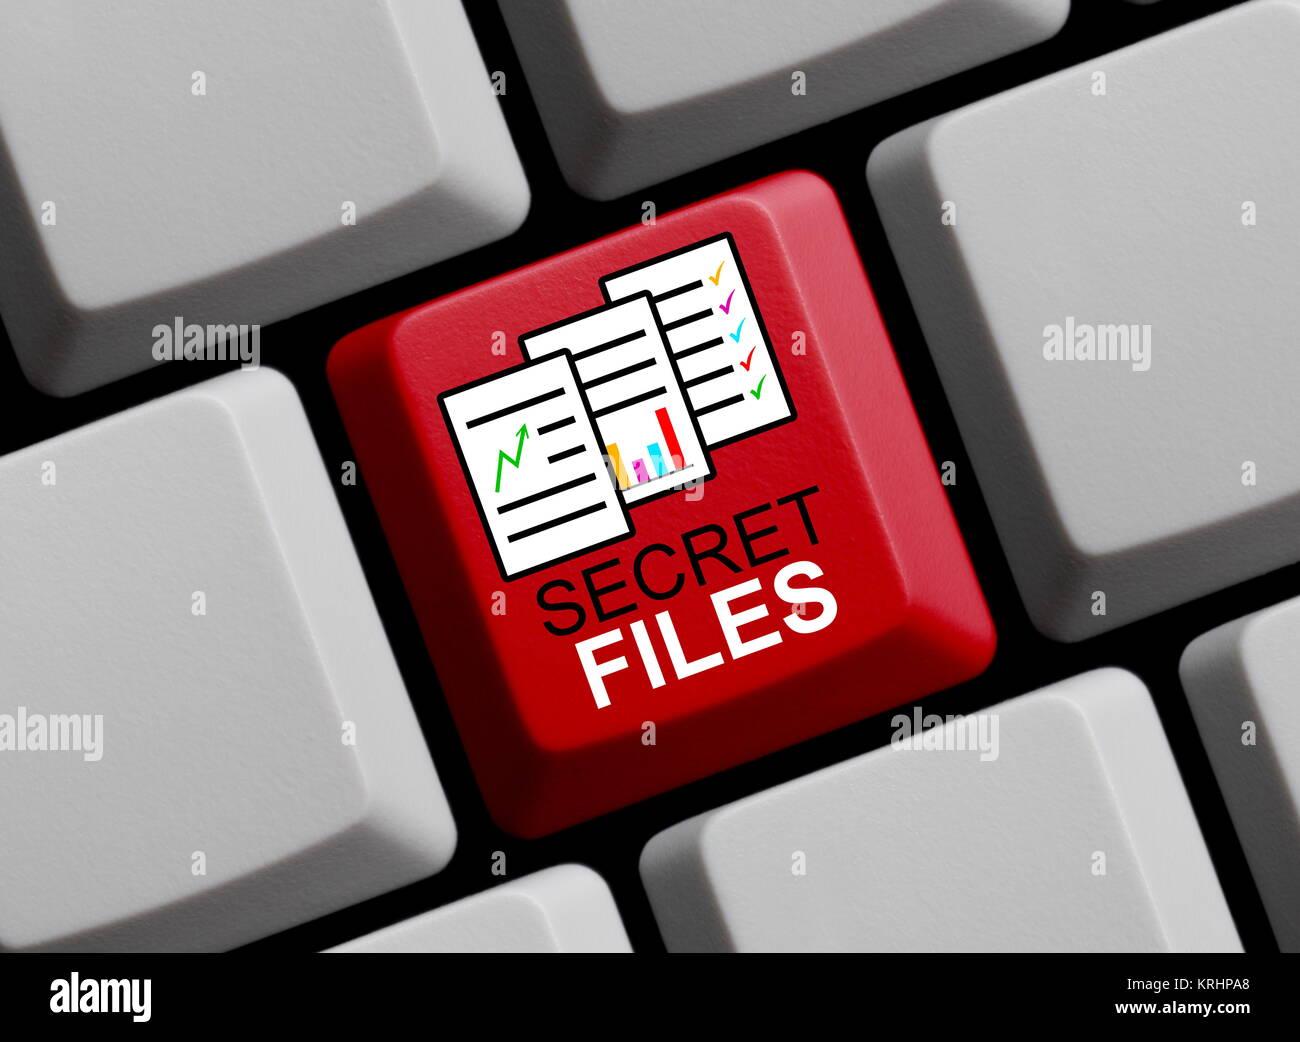 secret files online - Stock Image